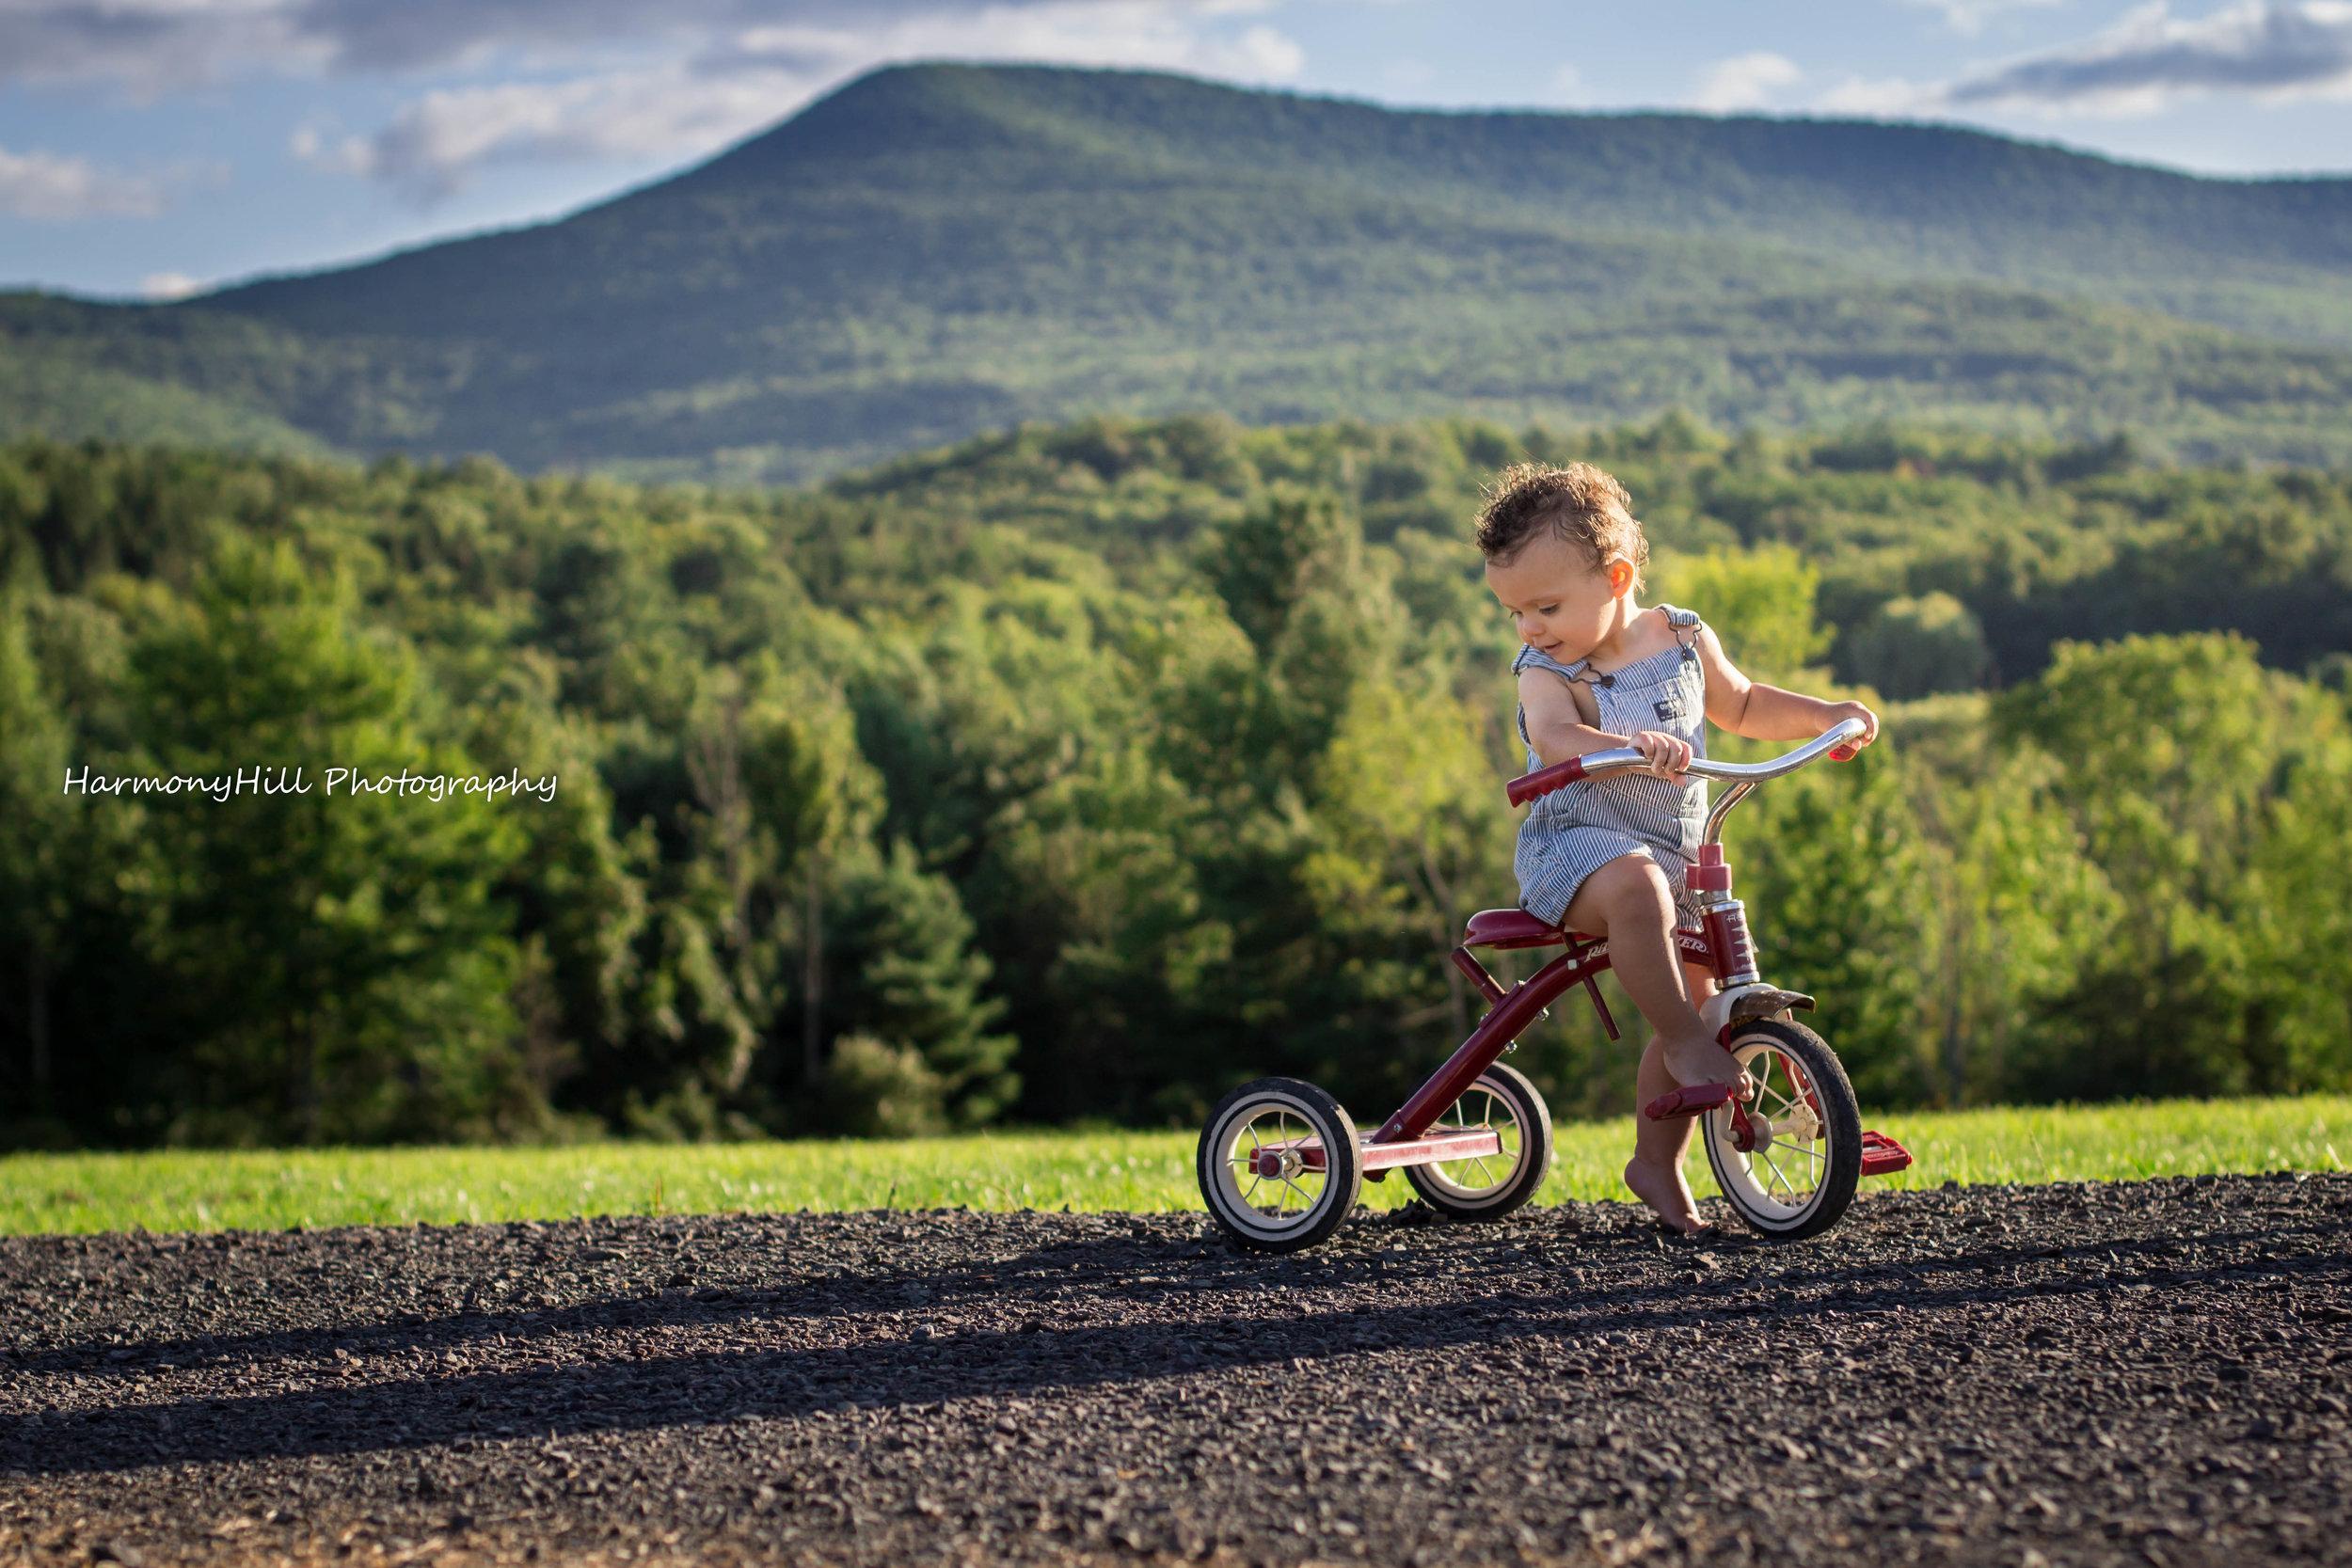 child portrait photography catskills harmony hill photography christine mcilhenny